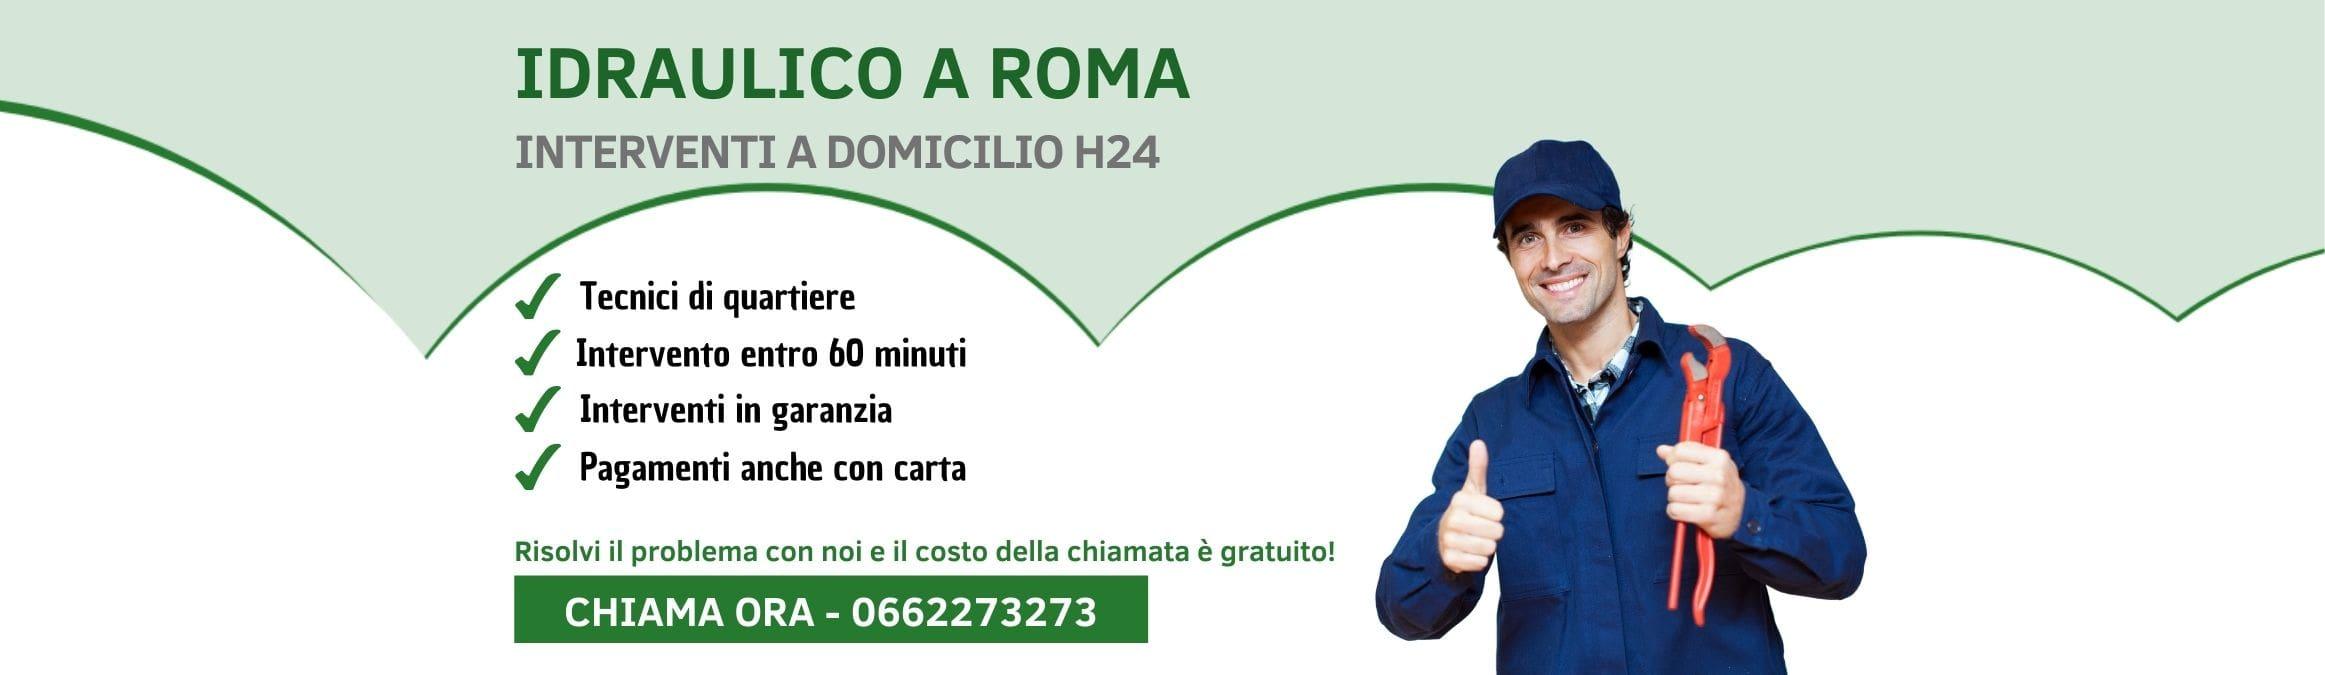 Idraulico Roma - Pronto Intervento h24